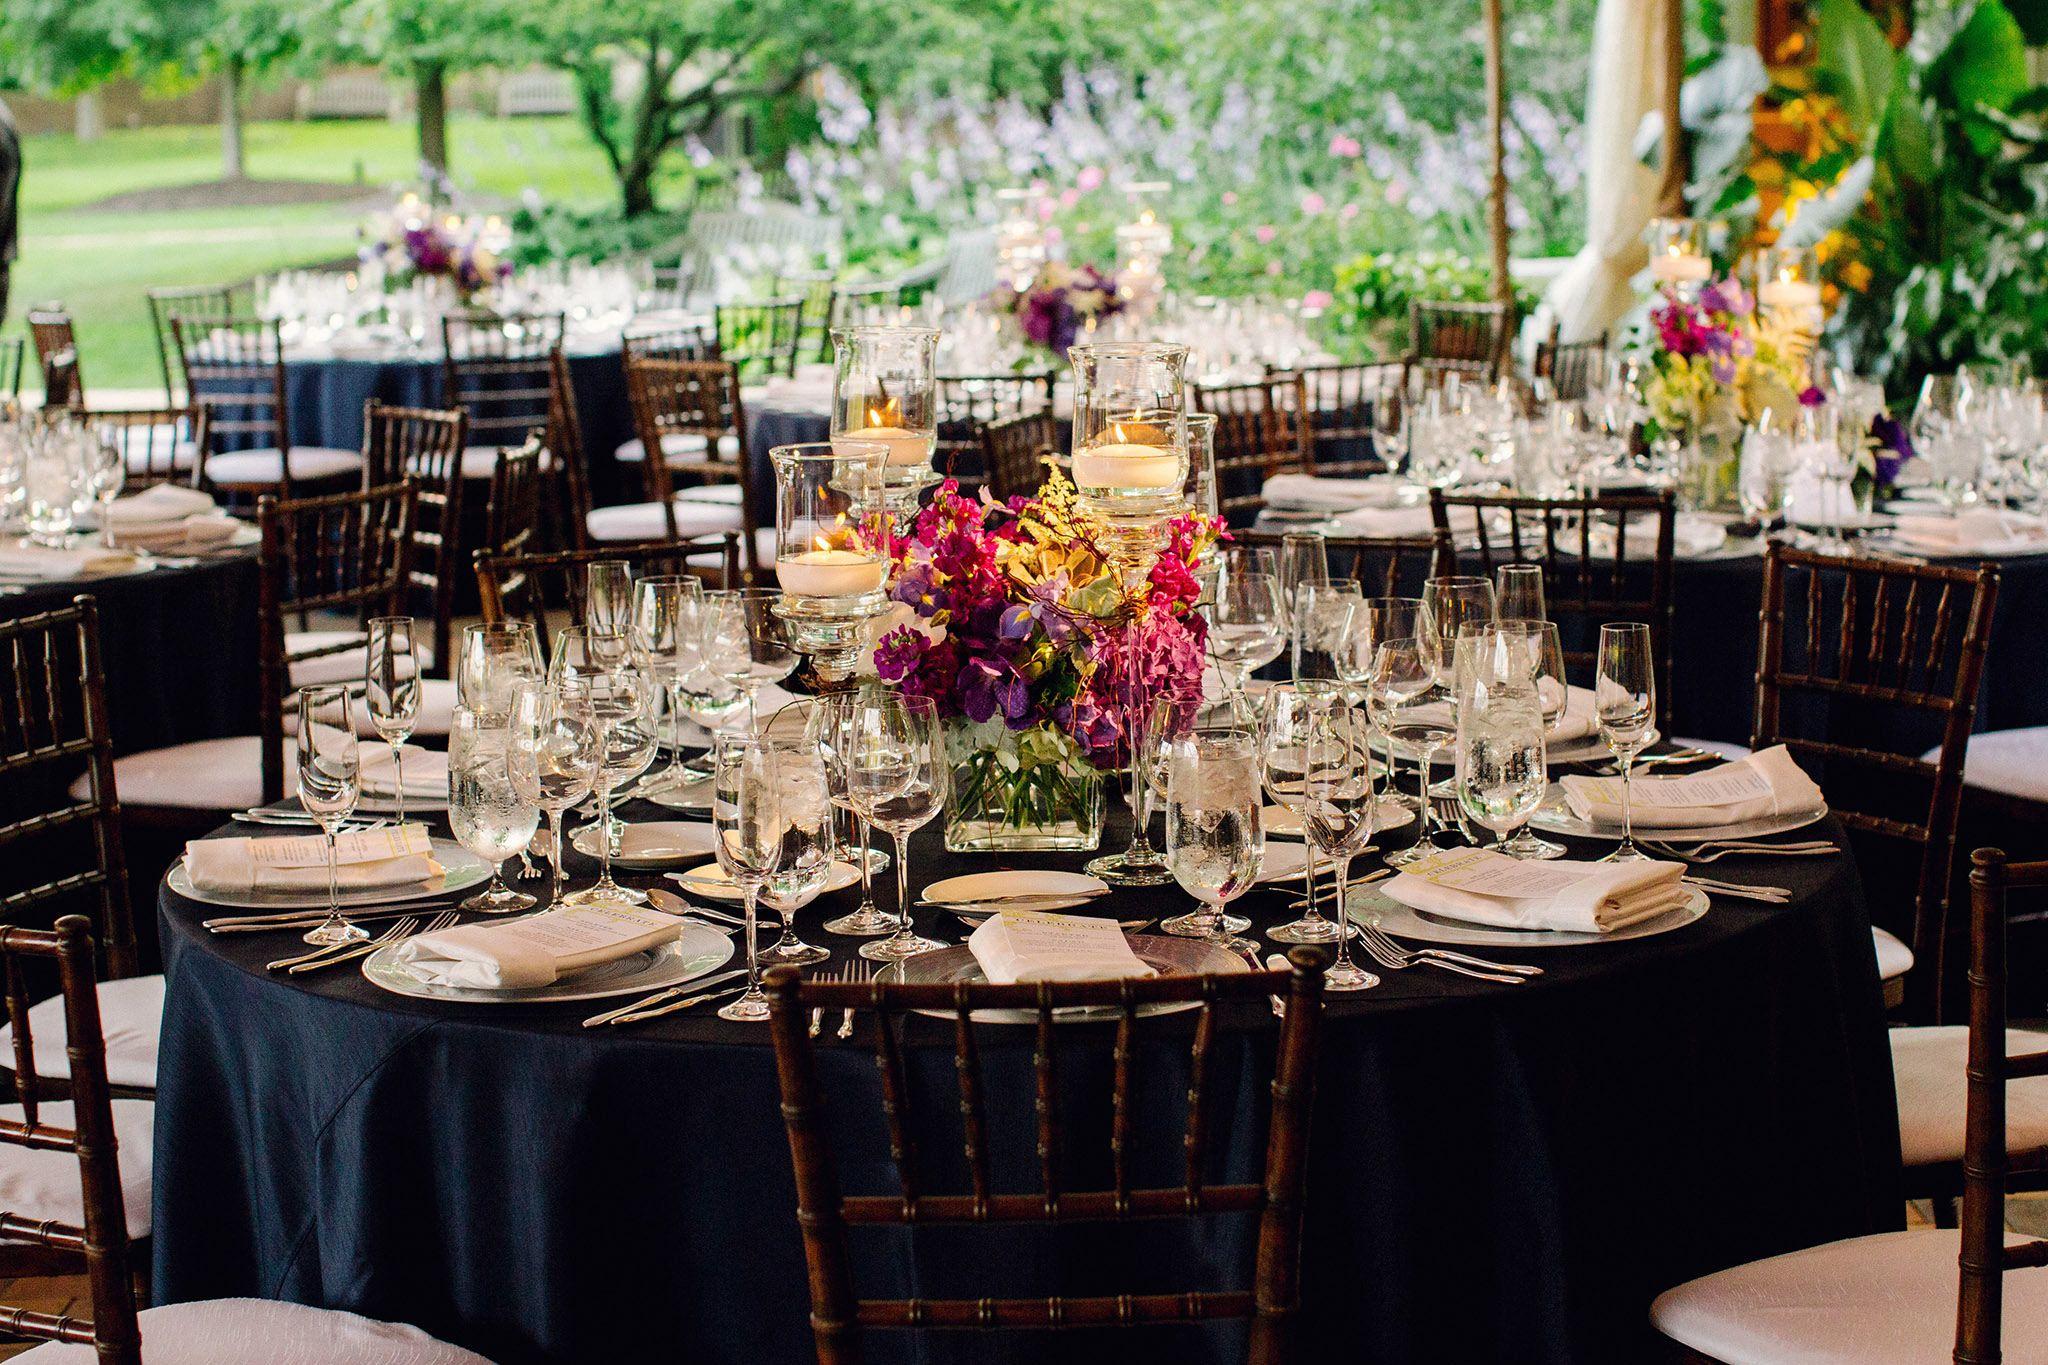 blisschicago weddings tables luxurious blisschicago weddings tables